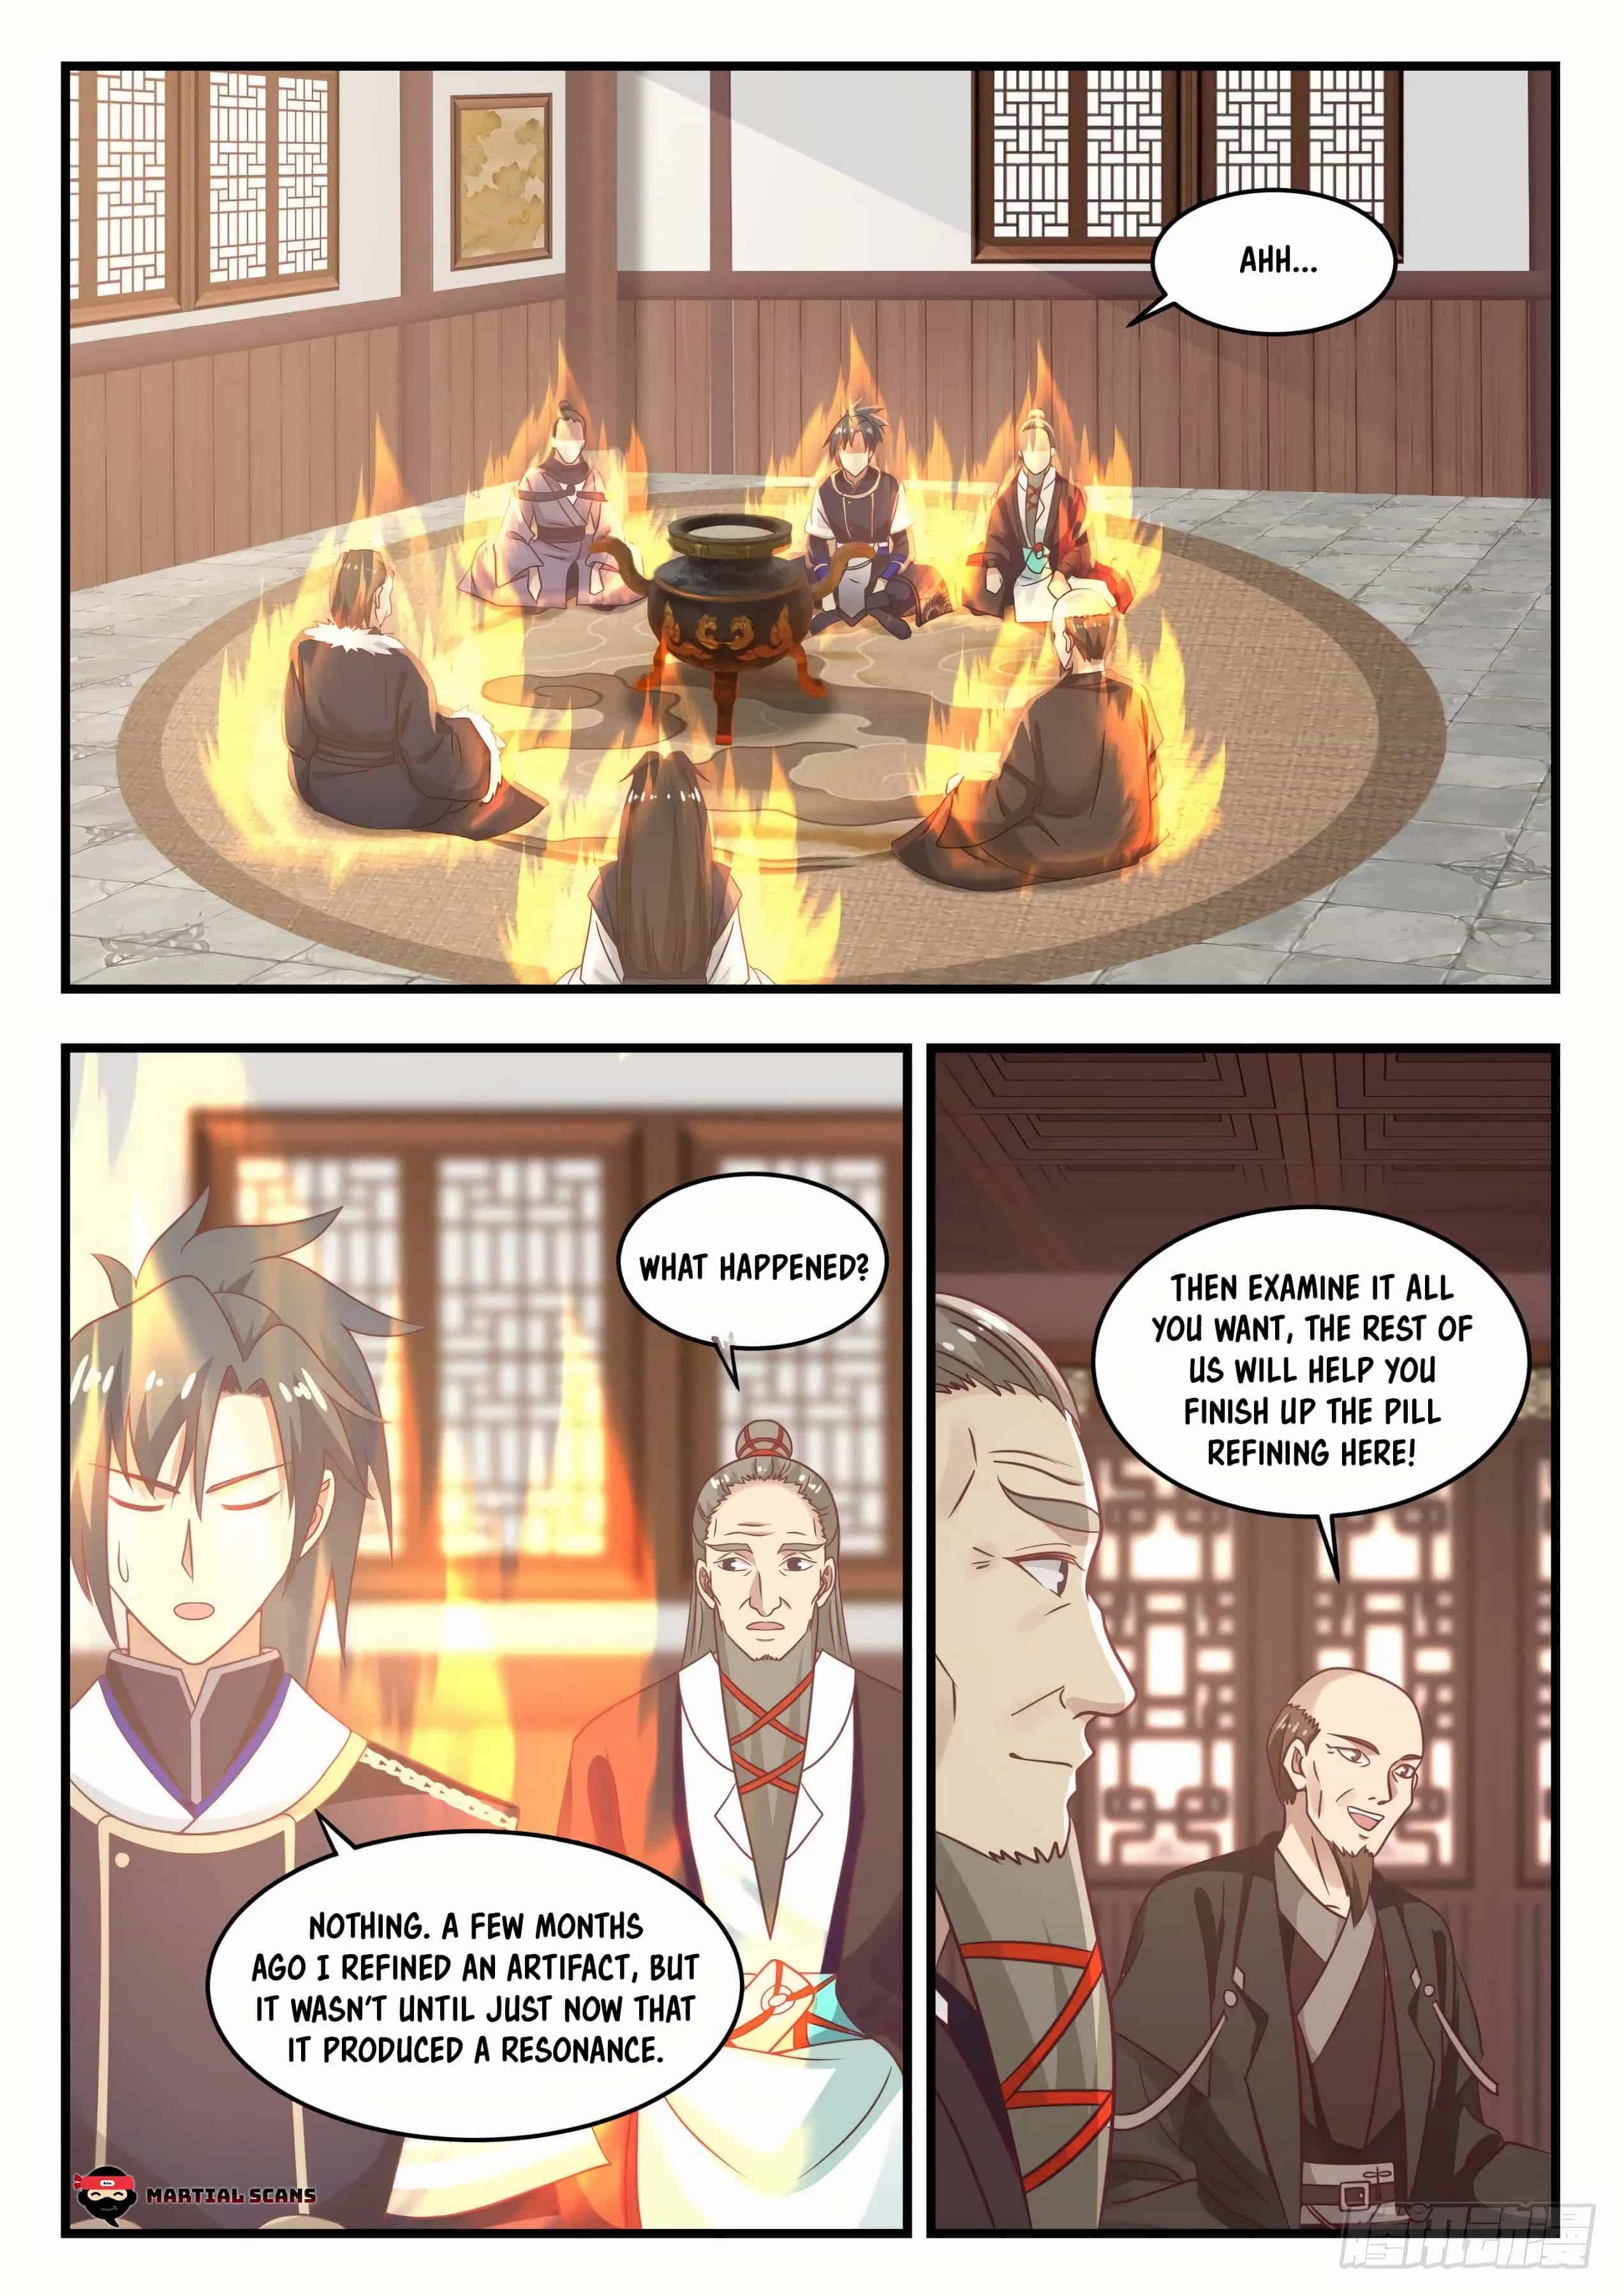 Martial Peak - chapter 750-eng-li